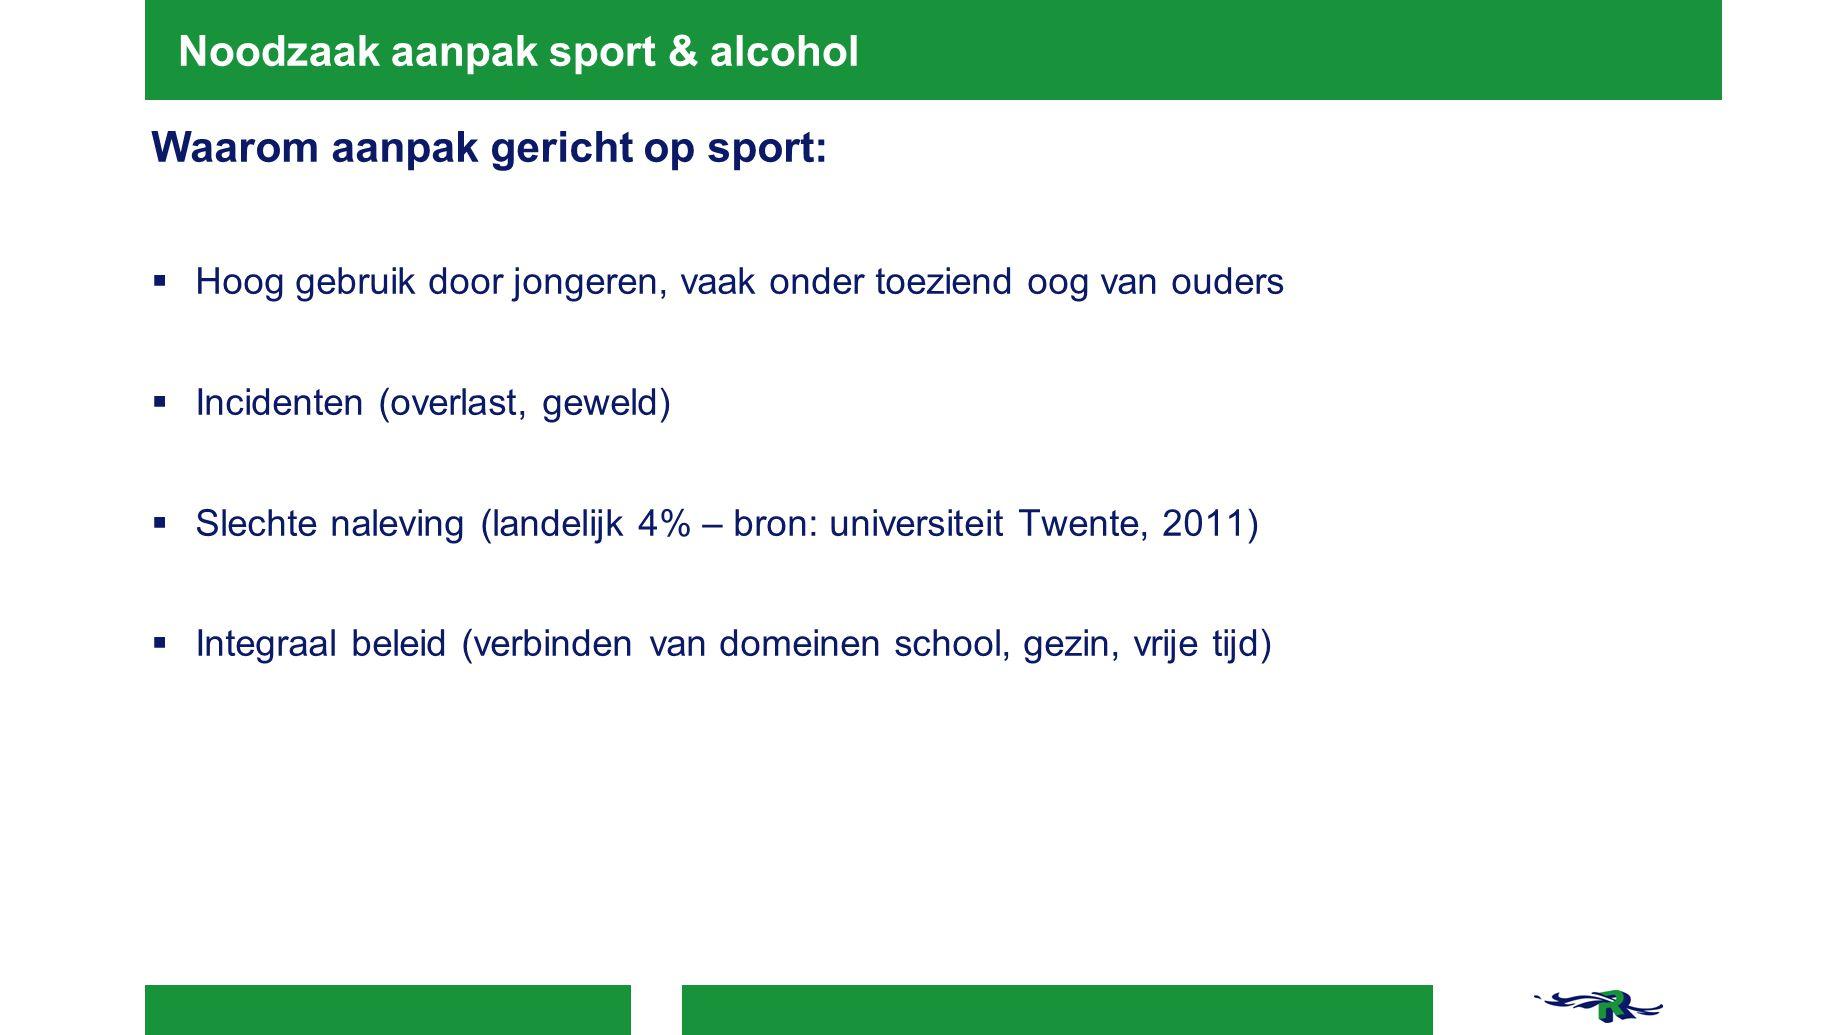 Noodzaak aanpak sport & alcohol